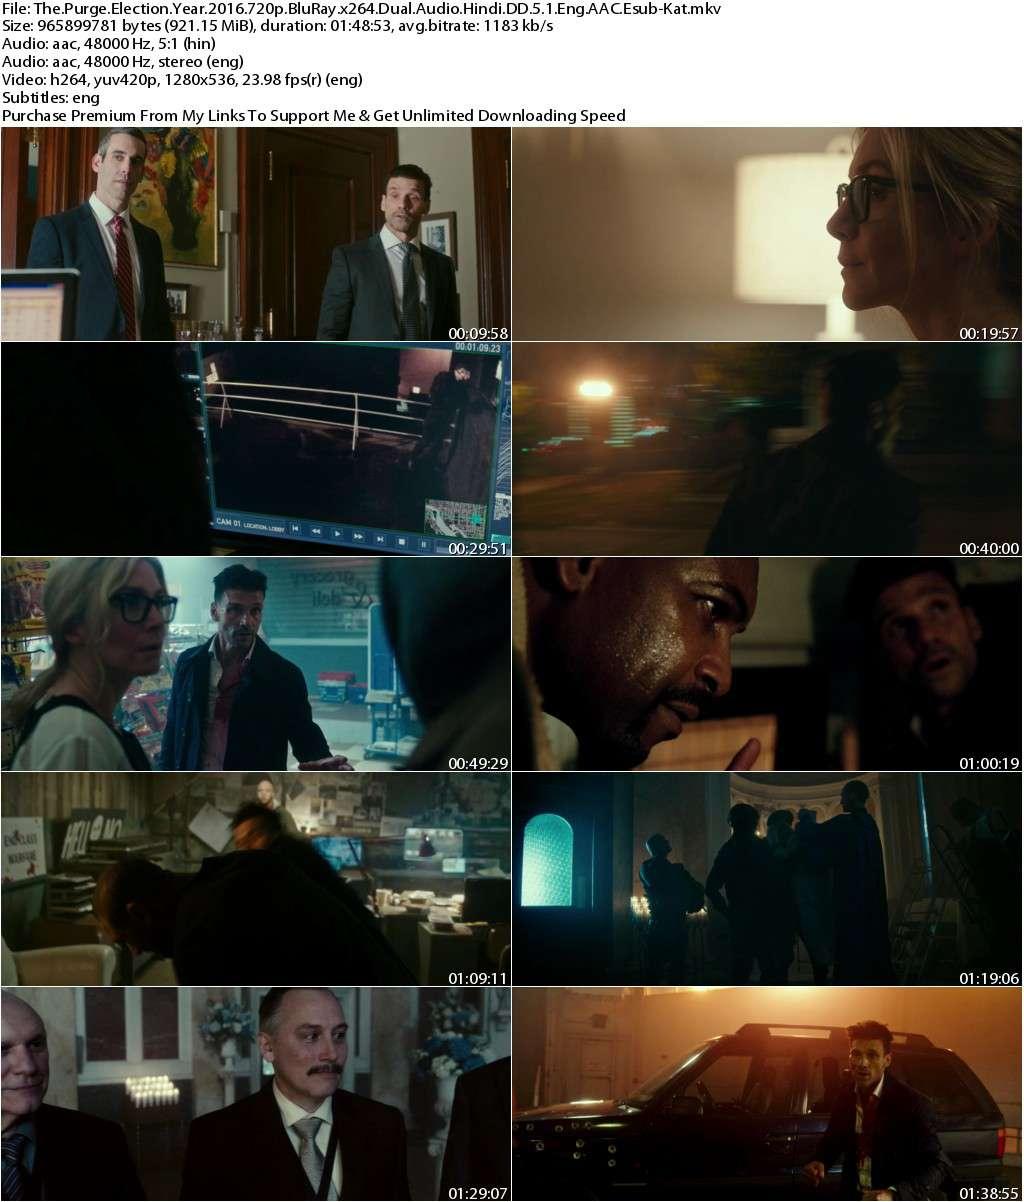 The Purge Election Year (2016) 720p BluRay Dual Audio [Hindi DD 5.1+Eng] AAC Esub-Kat